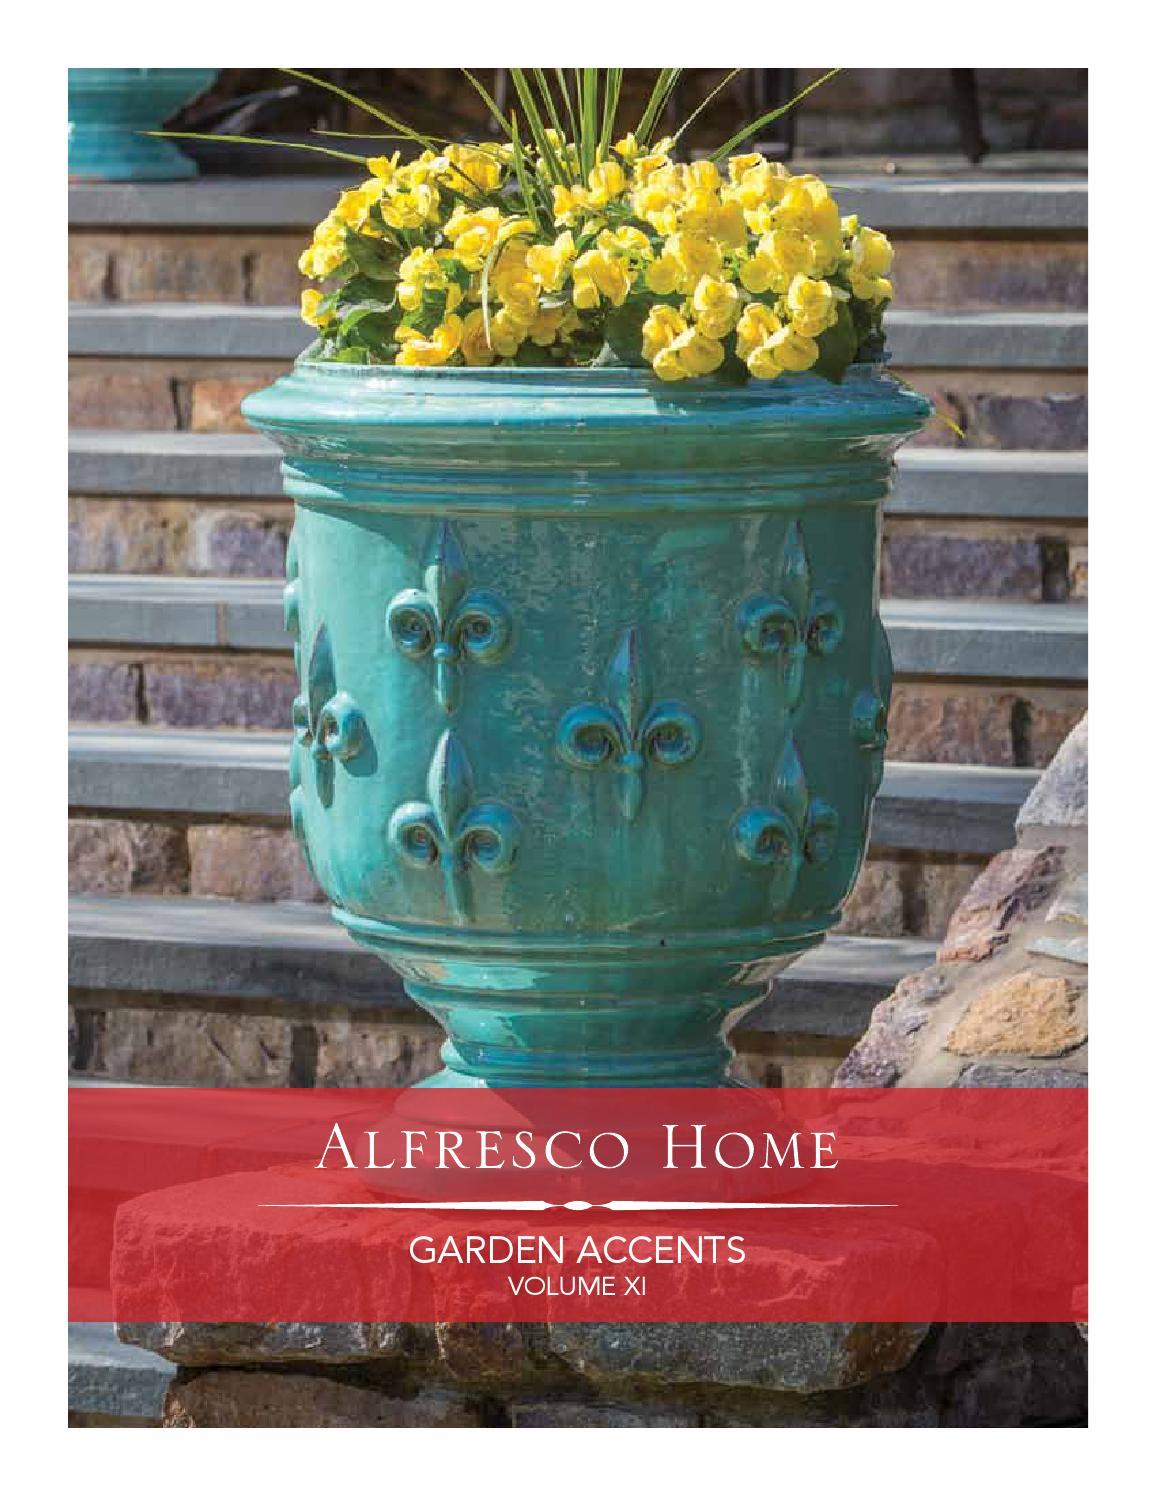 Planter Menthe En Pot alfresco home garden accents volume 11daniel alarcon jr